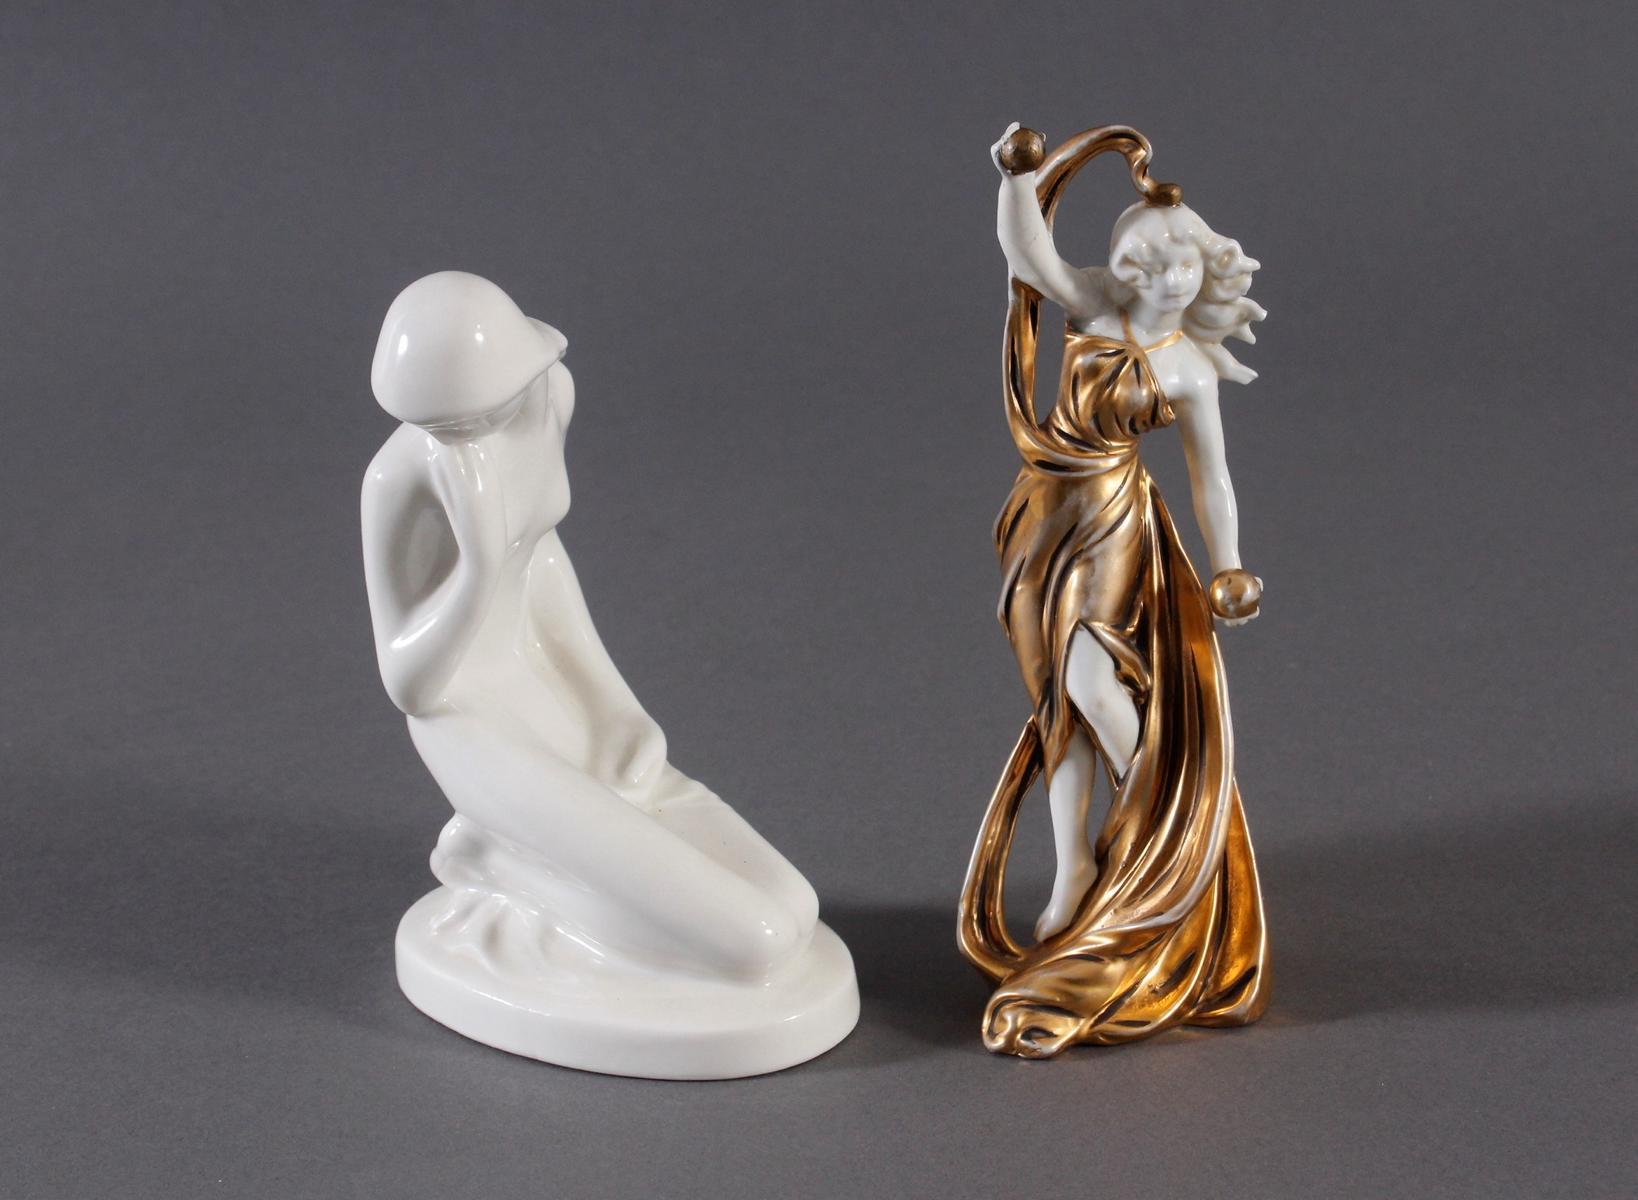 2 Porzellan Figuren